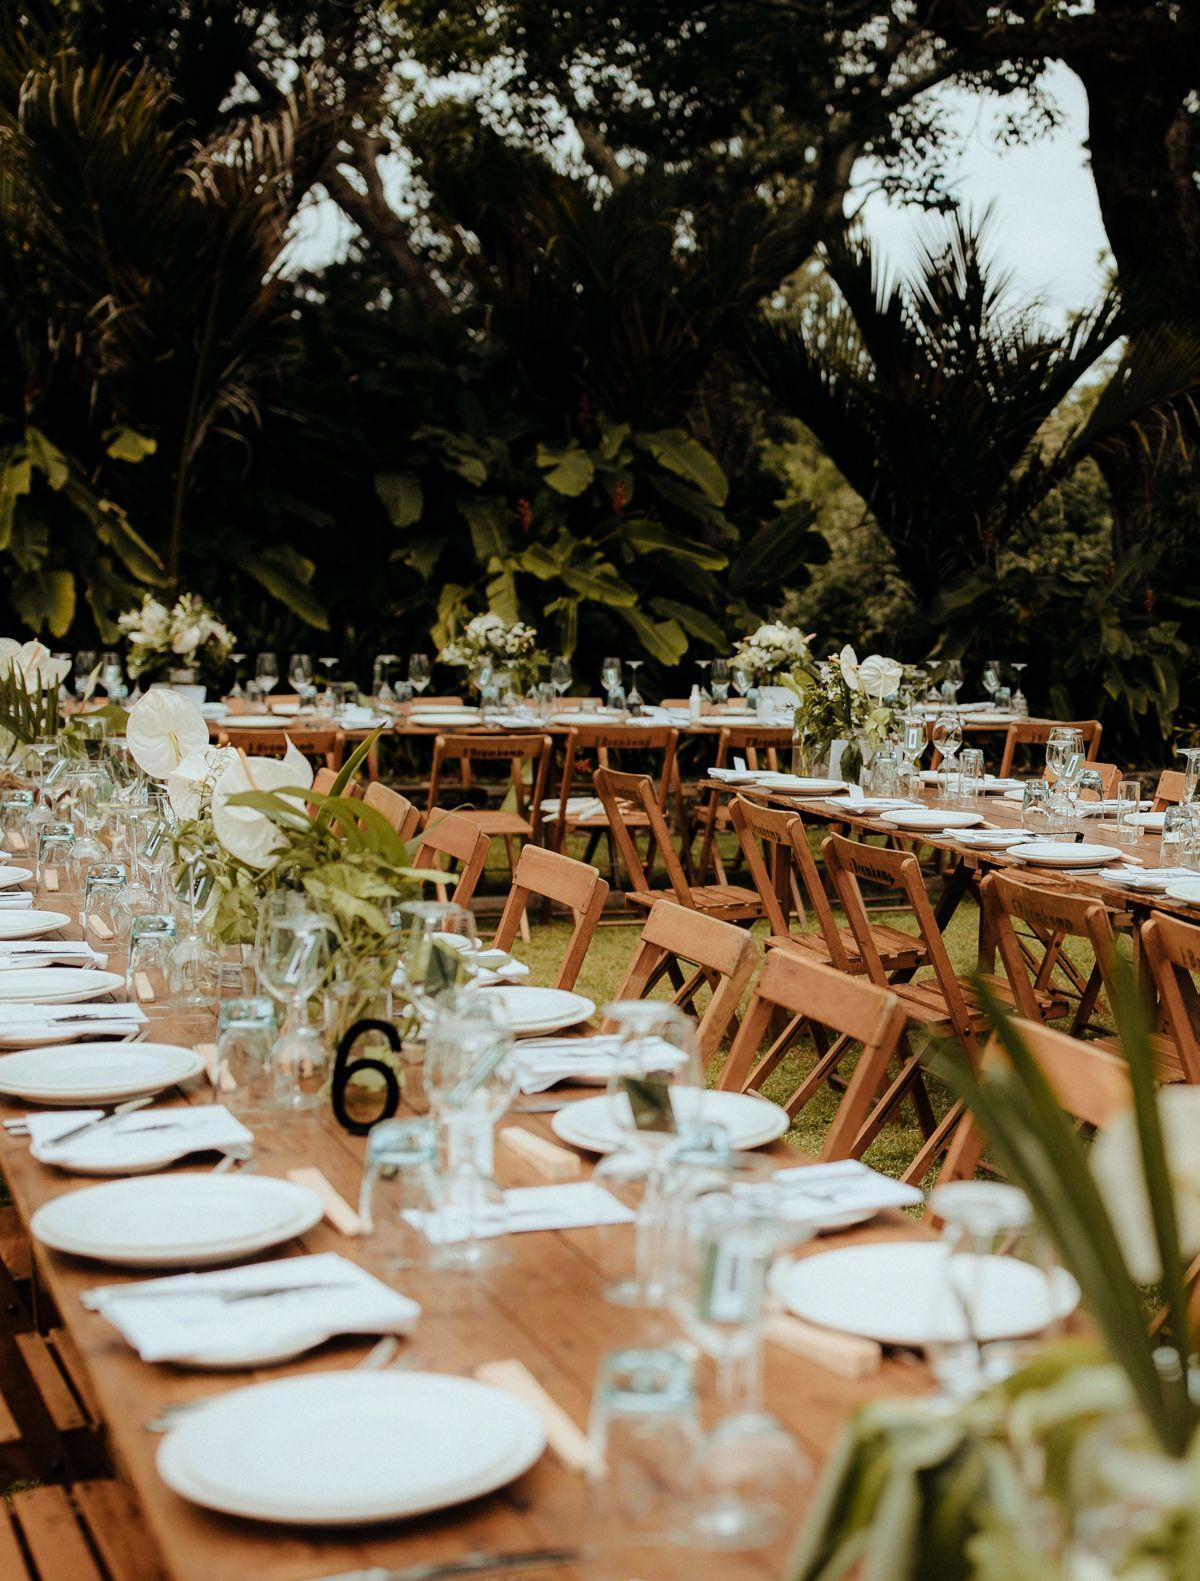 Black Acrylic Wedding Table Numbers Handmade Wedding Decor Gifts